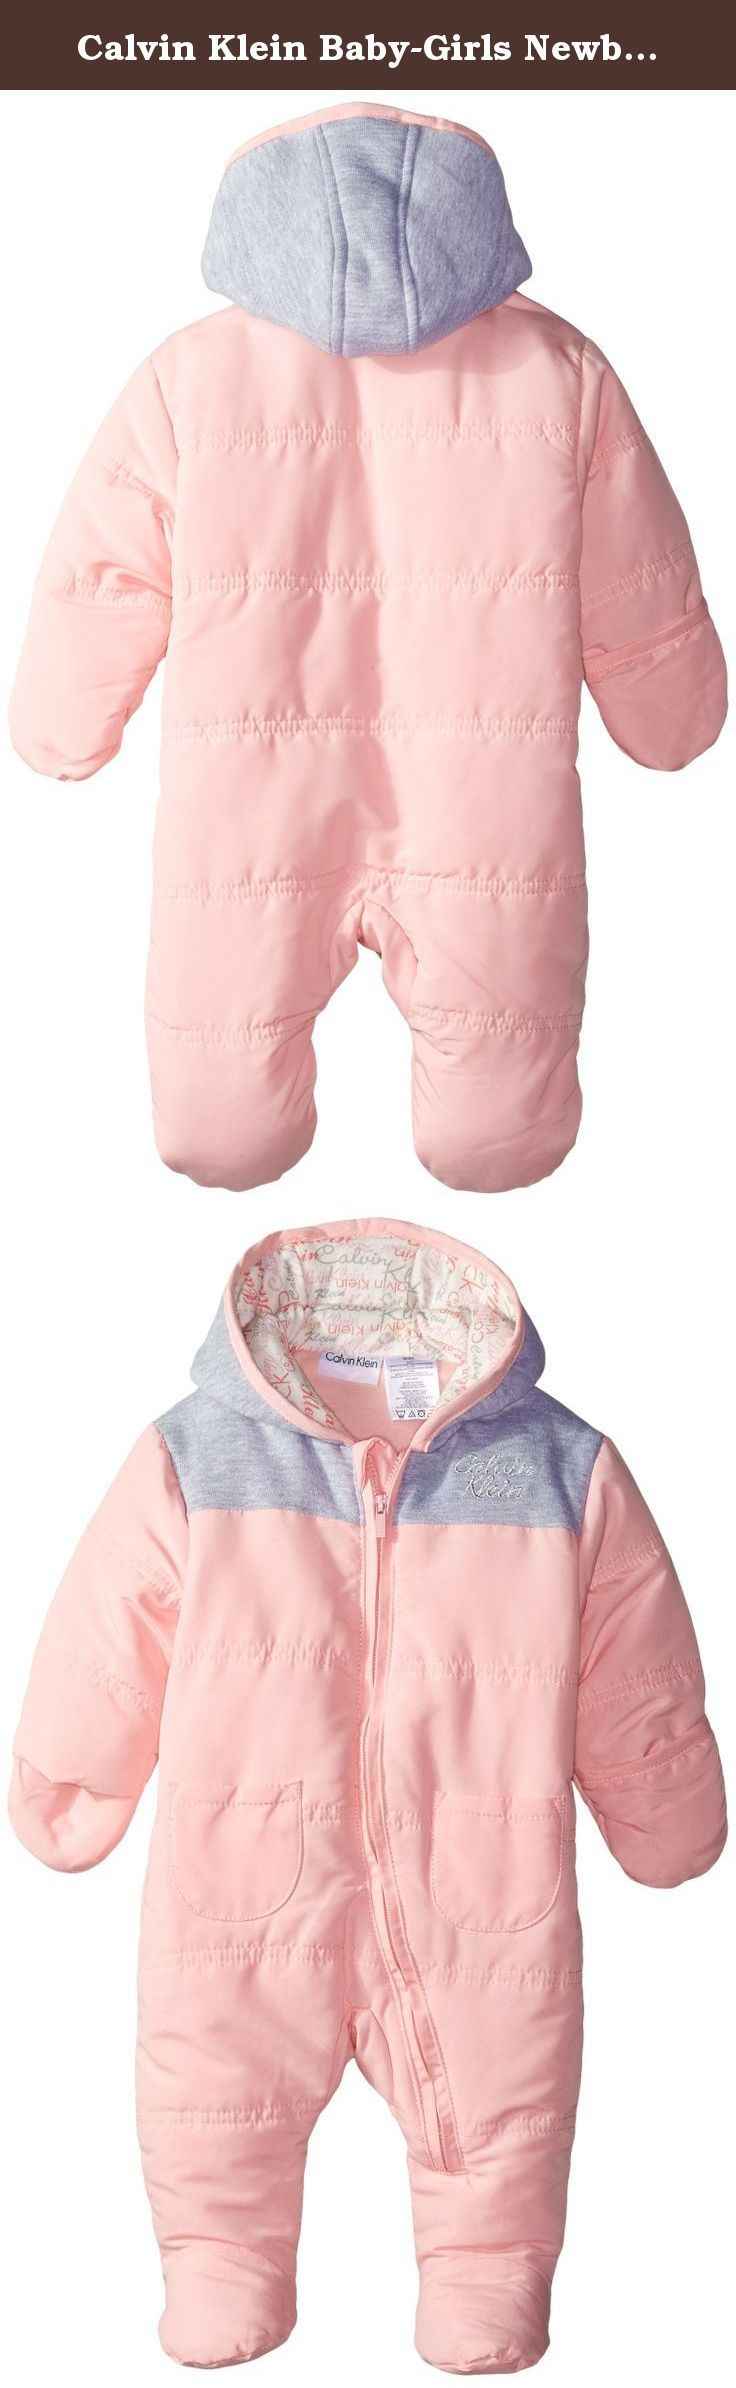 Calvin Klein Baby-Girls Newborn Hooded Gray Pink Pram, Gray/Pink, 6-9 Months. Pram.